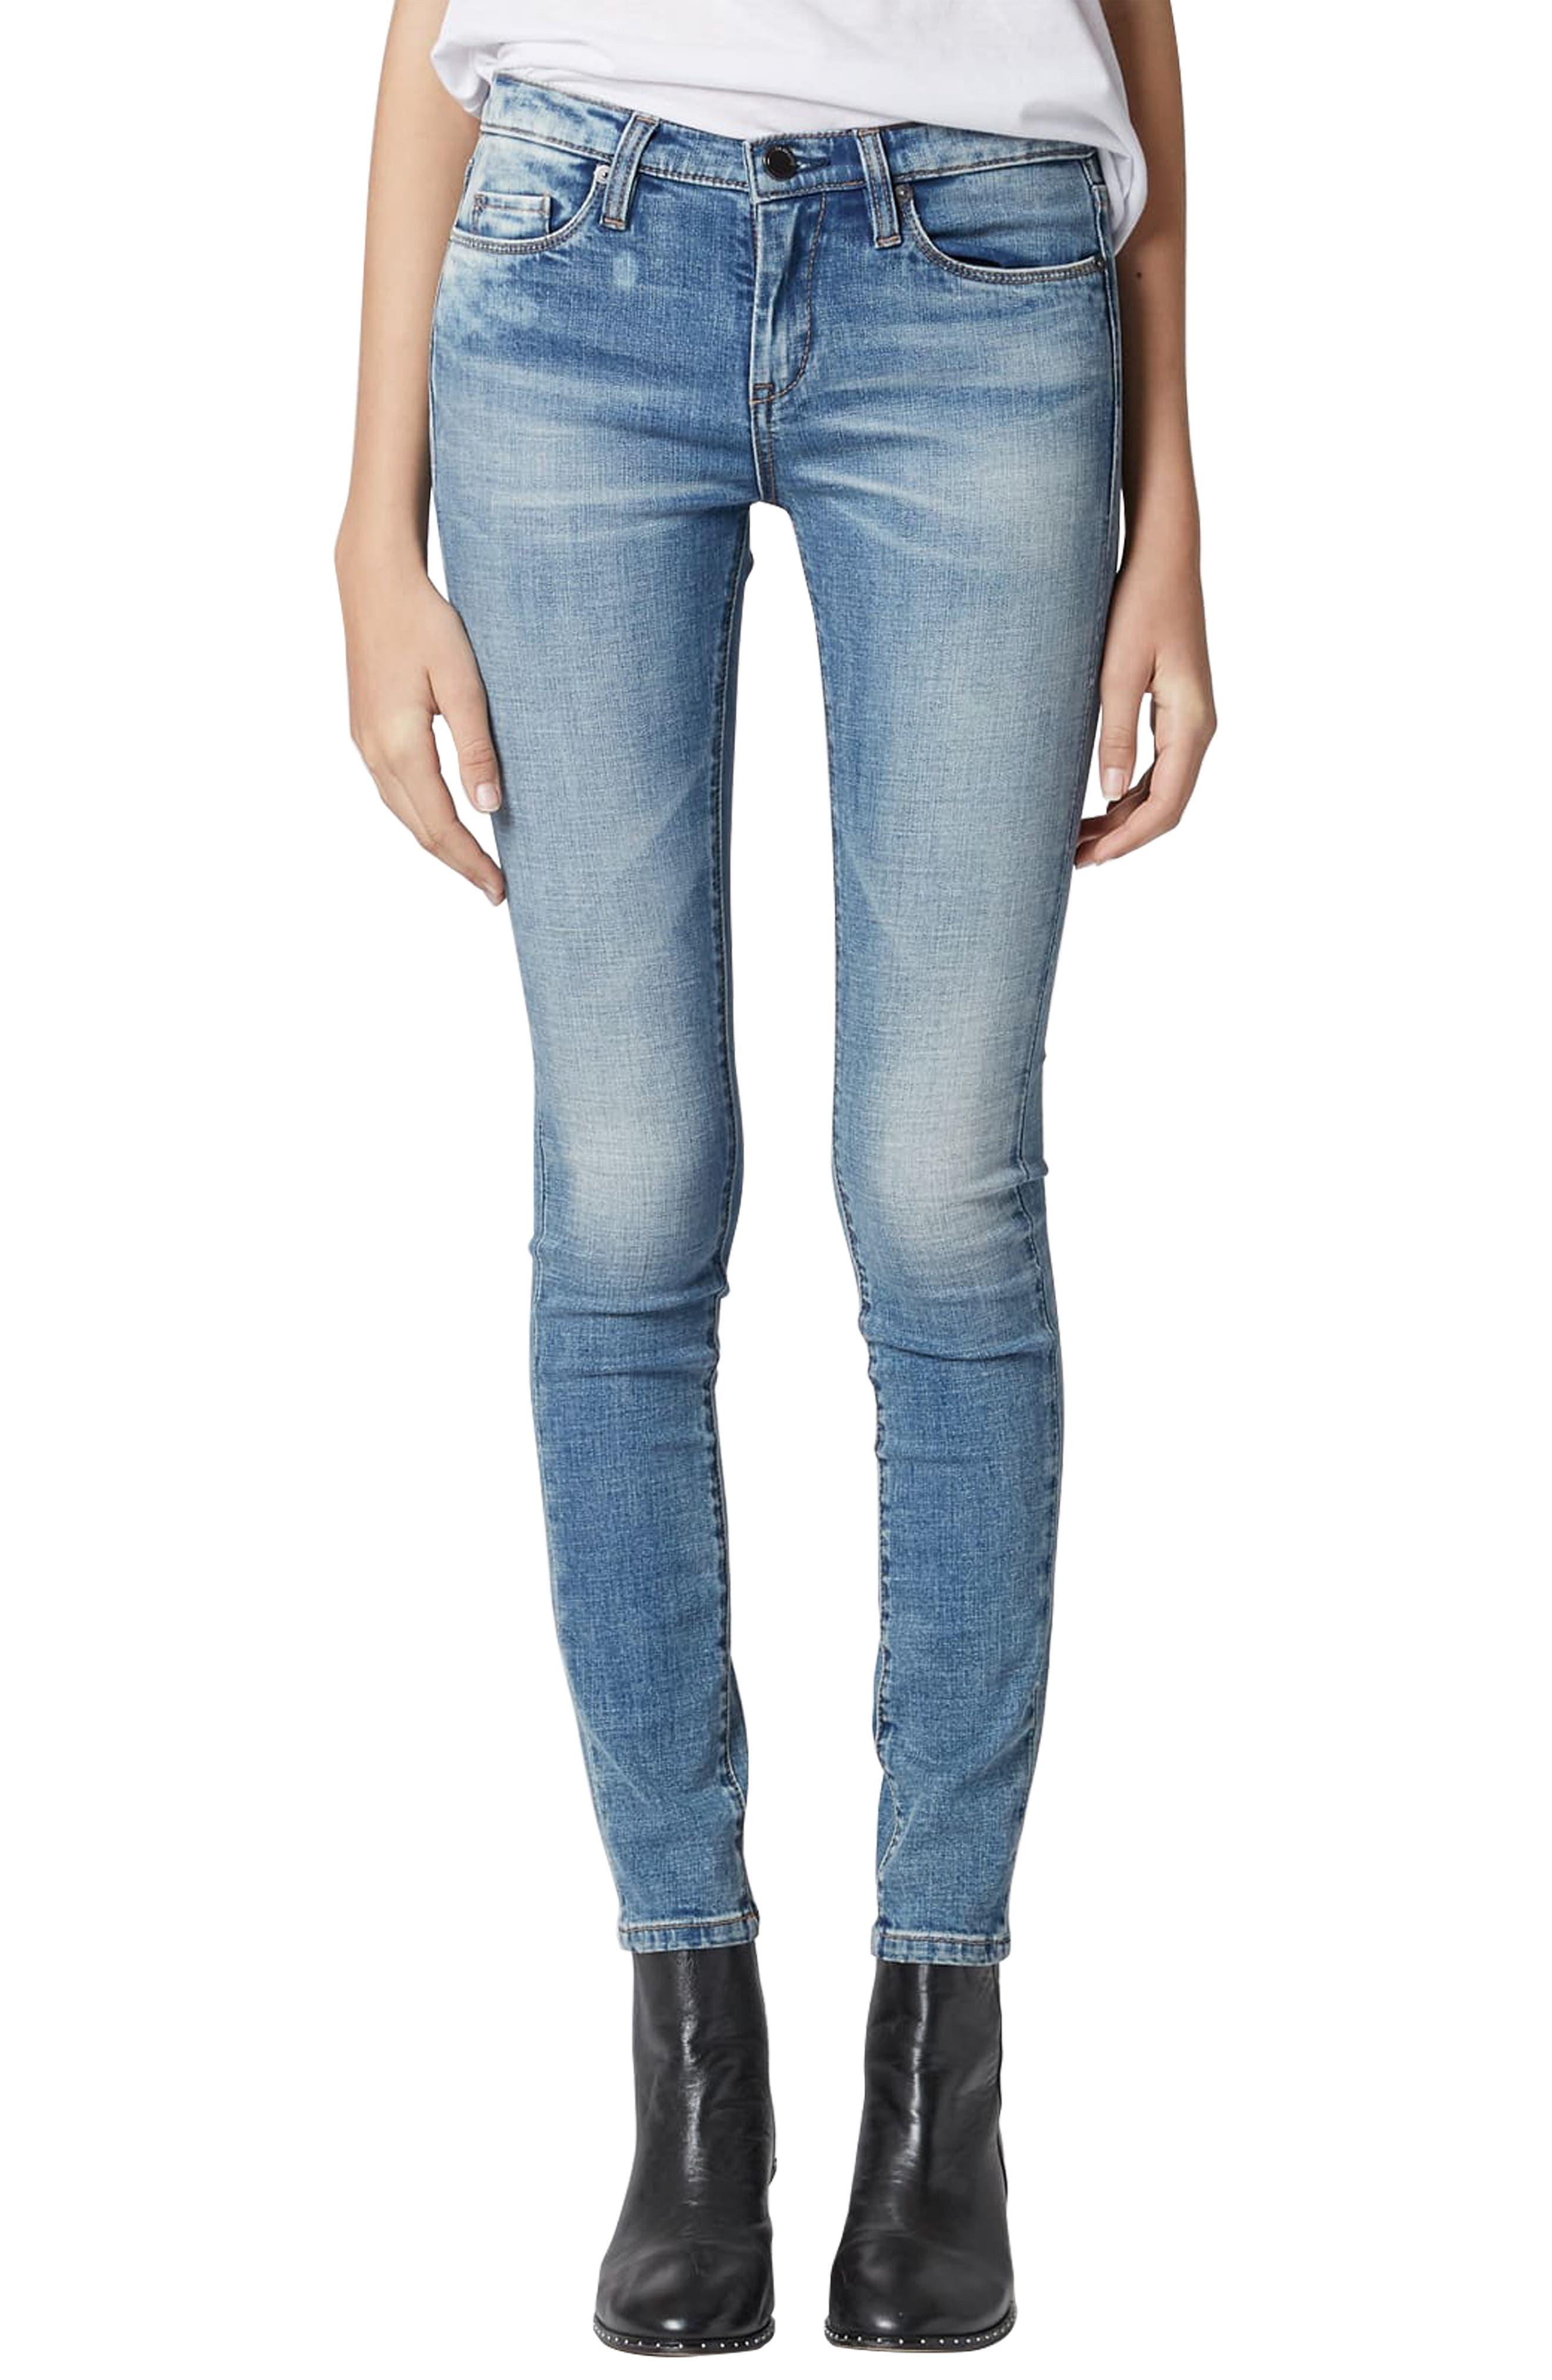 BLANKNYC,                             The Reade Skinny Jeans,                             Main thumbnail 1, color,                             LAGUNA BEACH